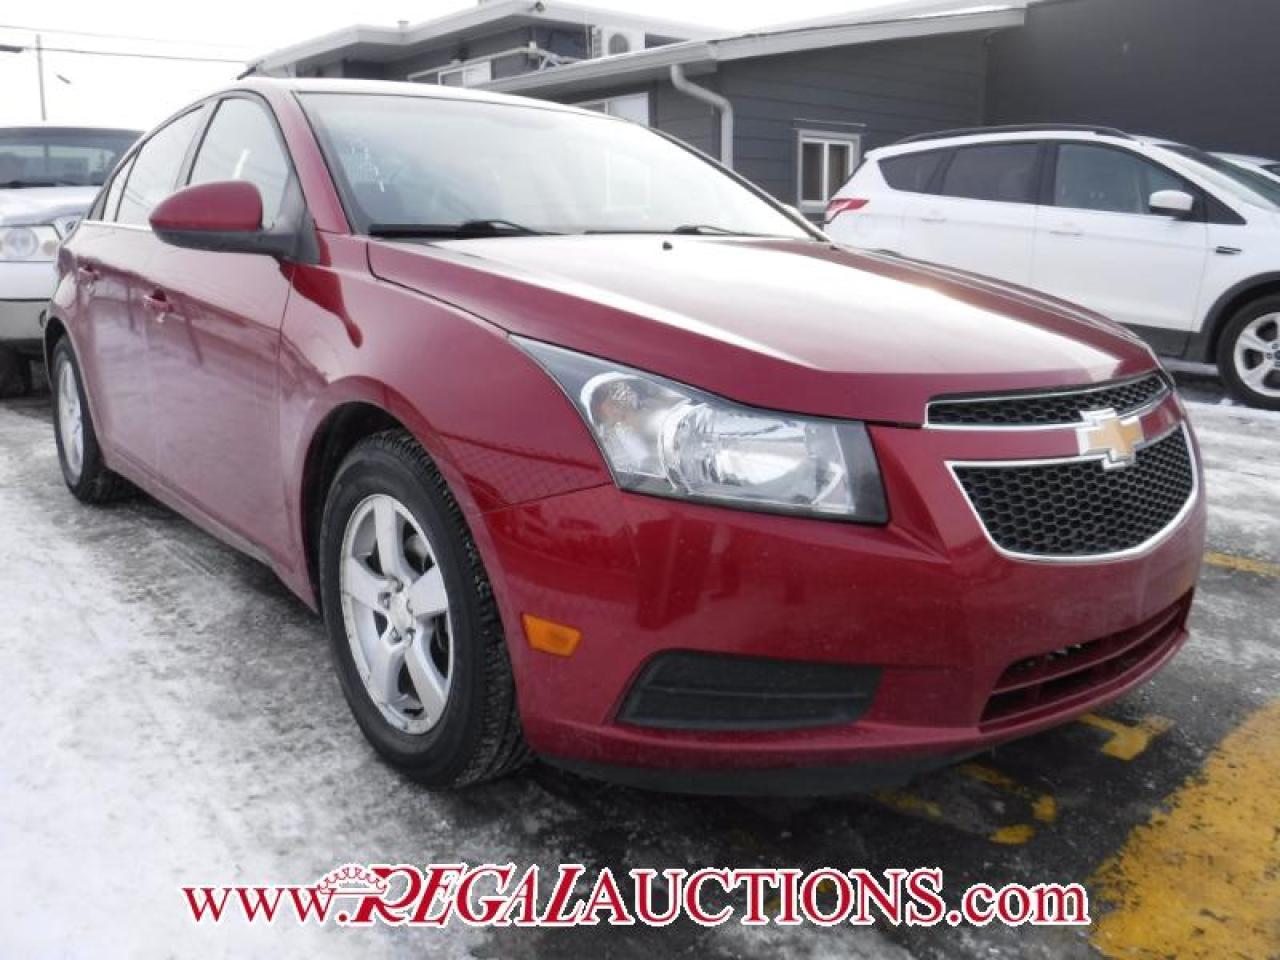 Photo of Red 2013 Chevrolet CRUZE LT 4D SEDAN TURBO